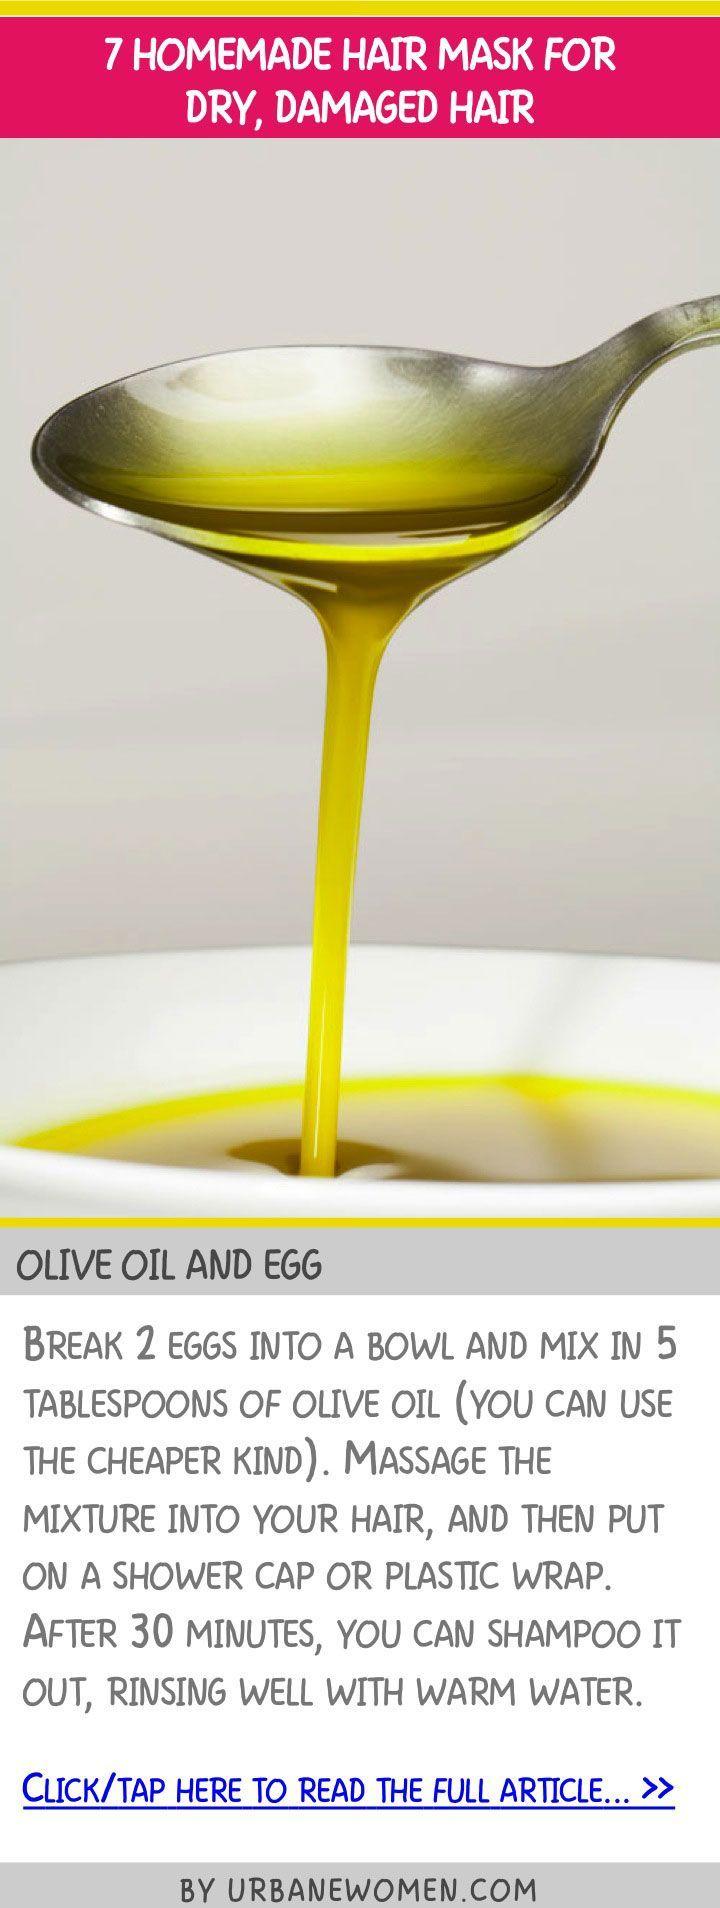 7 homemade hair mask for dry, damaged hair - Olive oil and egg